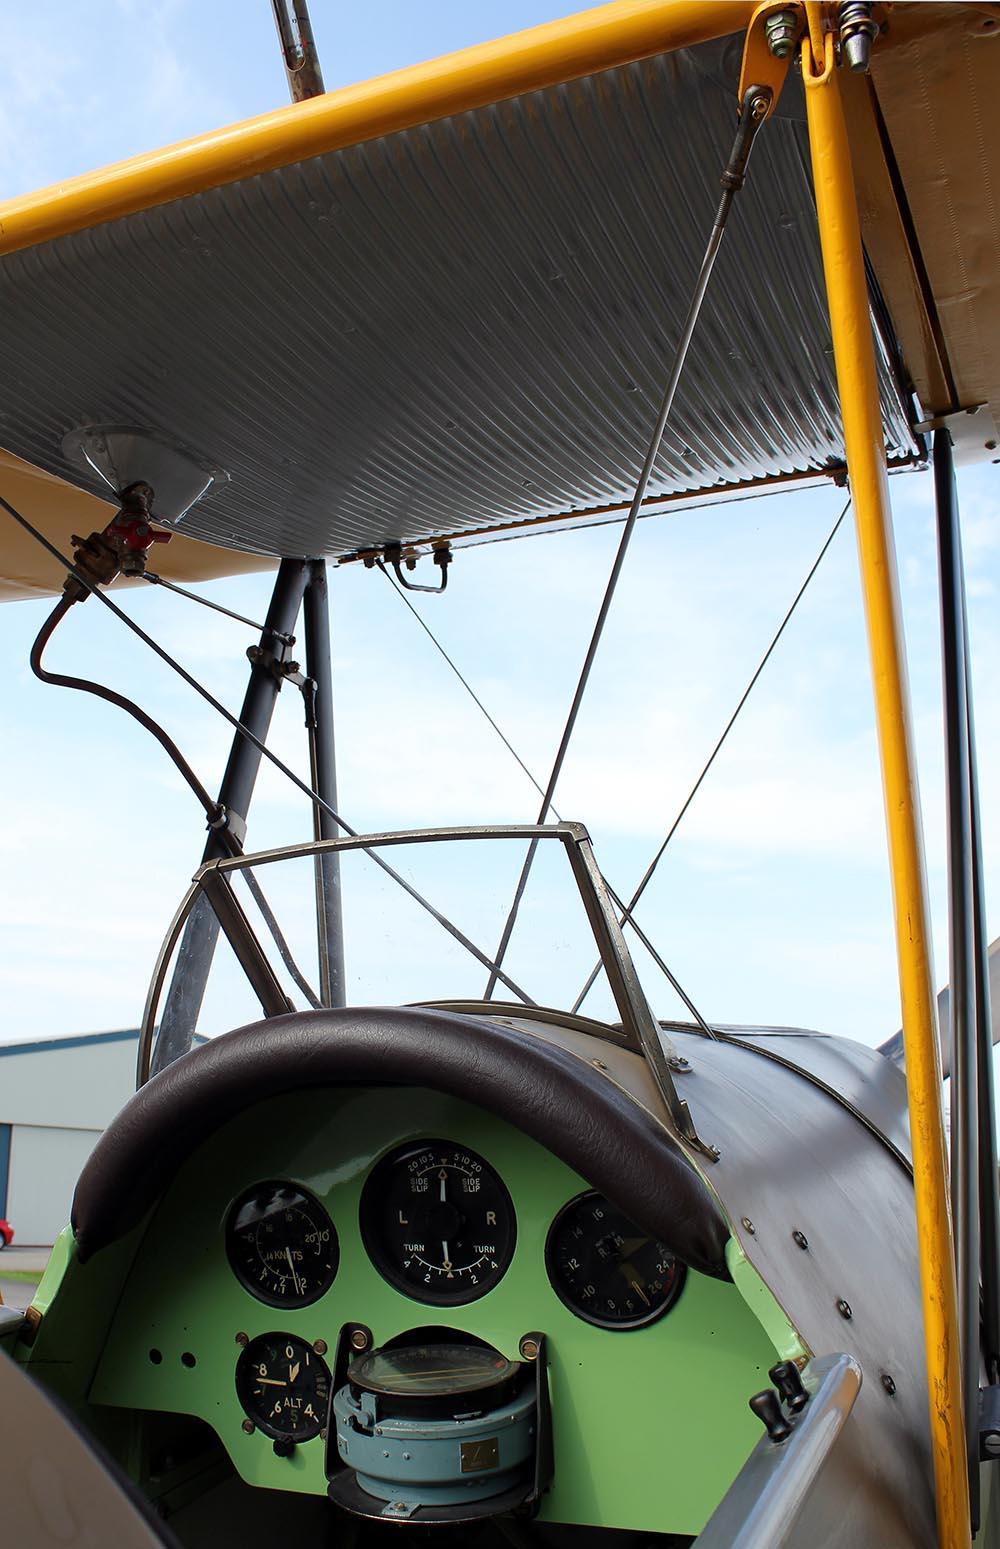 De_Havilland_TigerMoth_D-ECTM_2011-08-2513.jpg